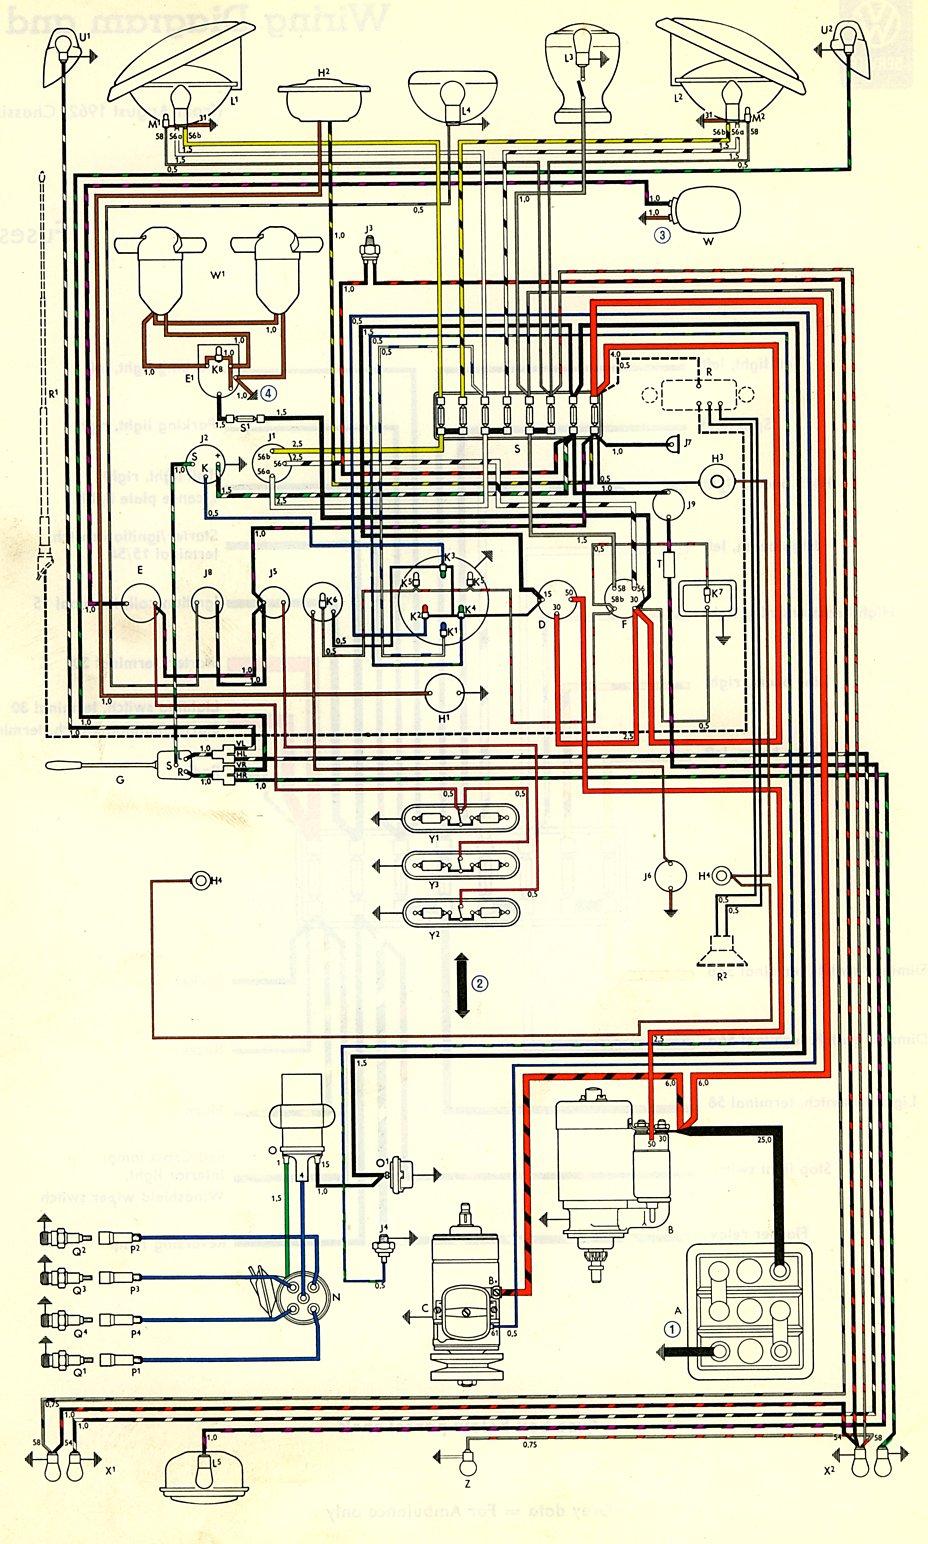 1971 Vw Bus Wiring Harness 1963 Bus Wiring Diagram Usa Thegoldenbug Com